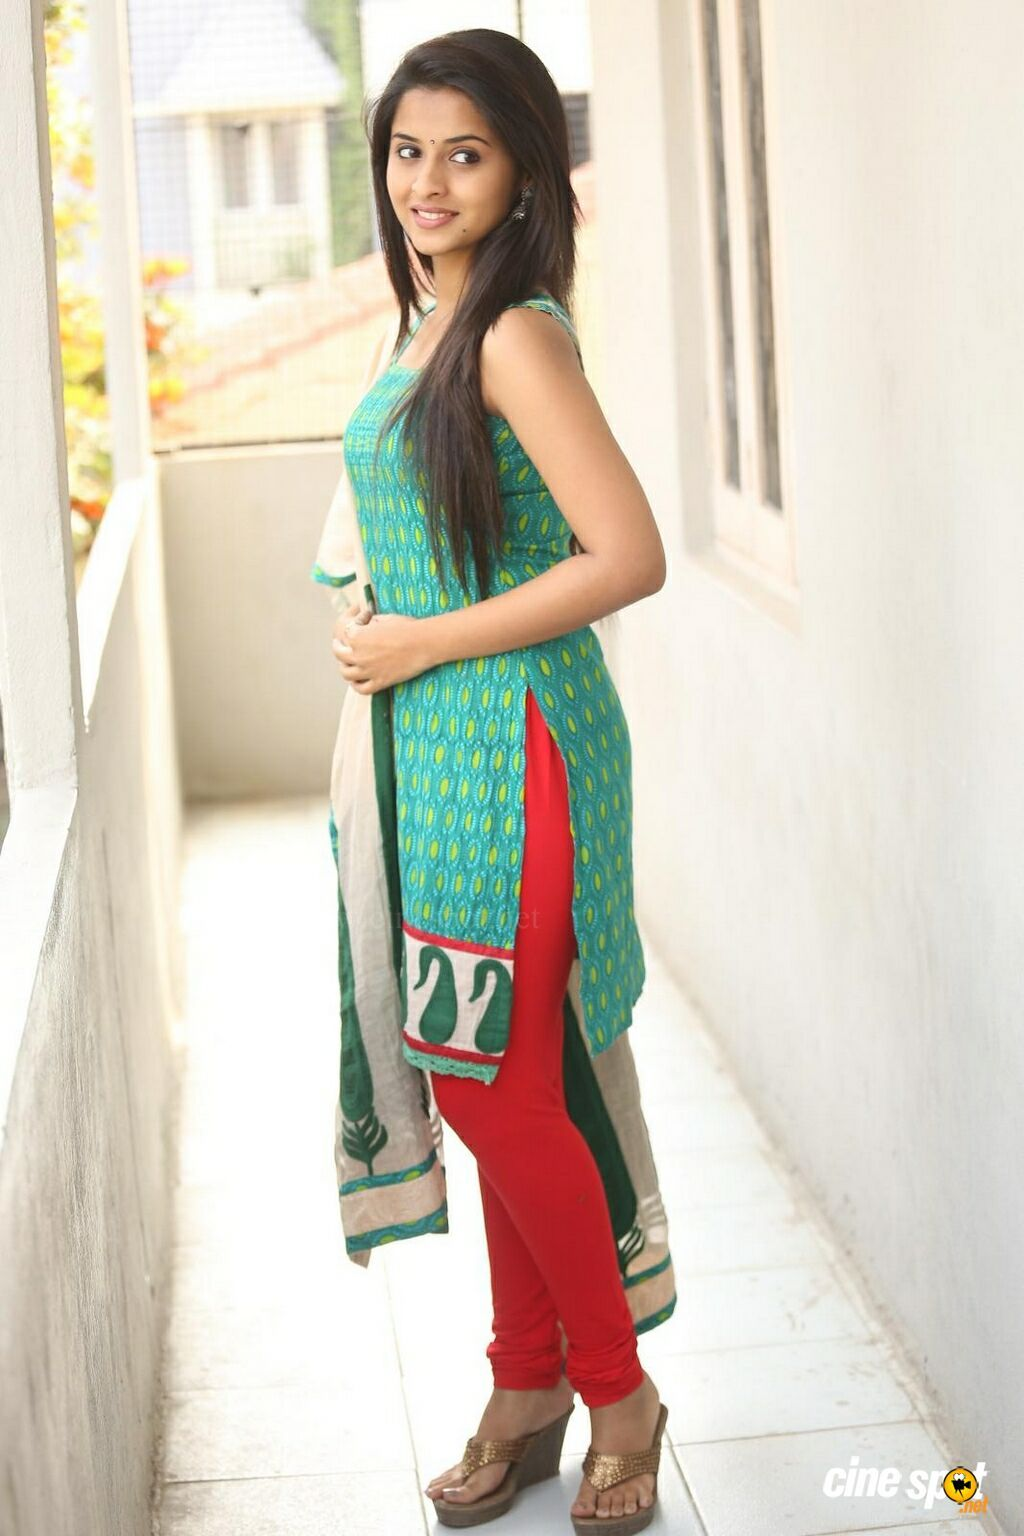 21f2963f39 Arthana New Photos (19) Child Actresses, Indian Actresses, Girl Fashion  Style,